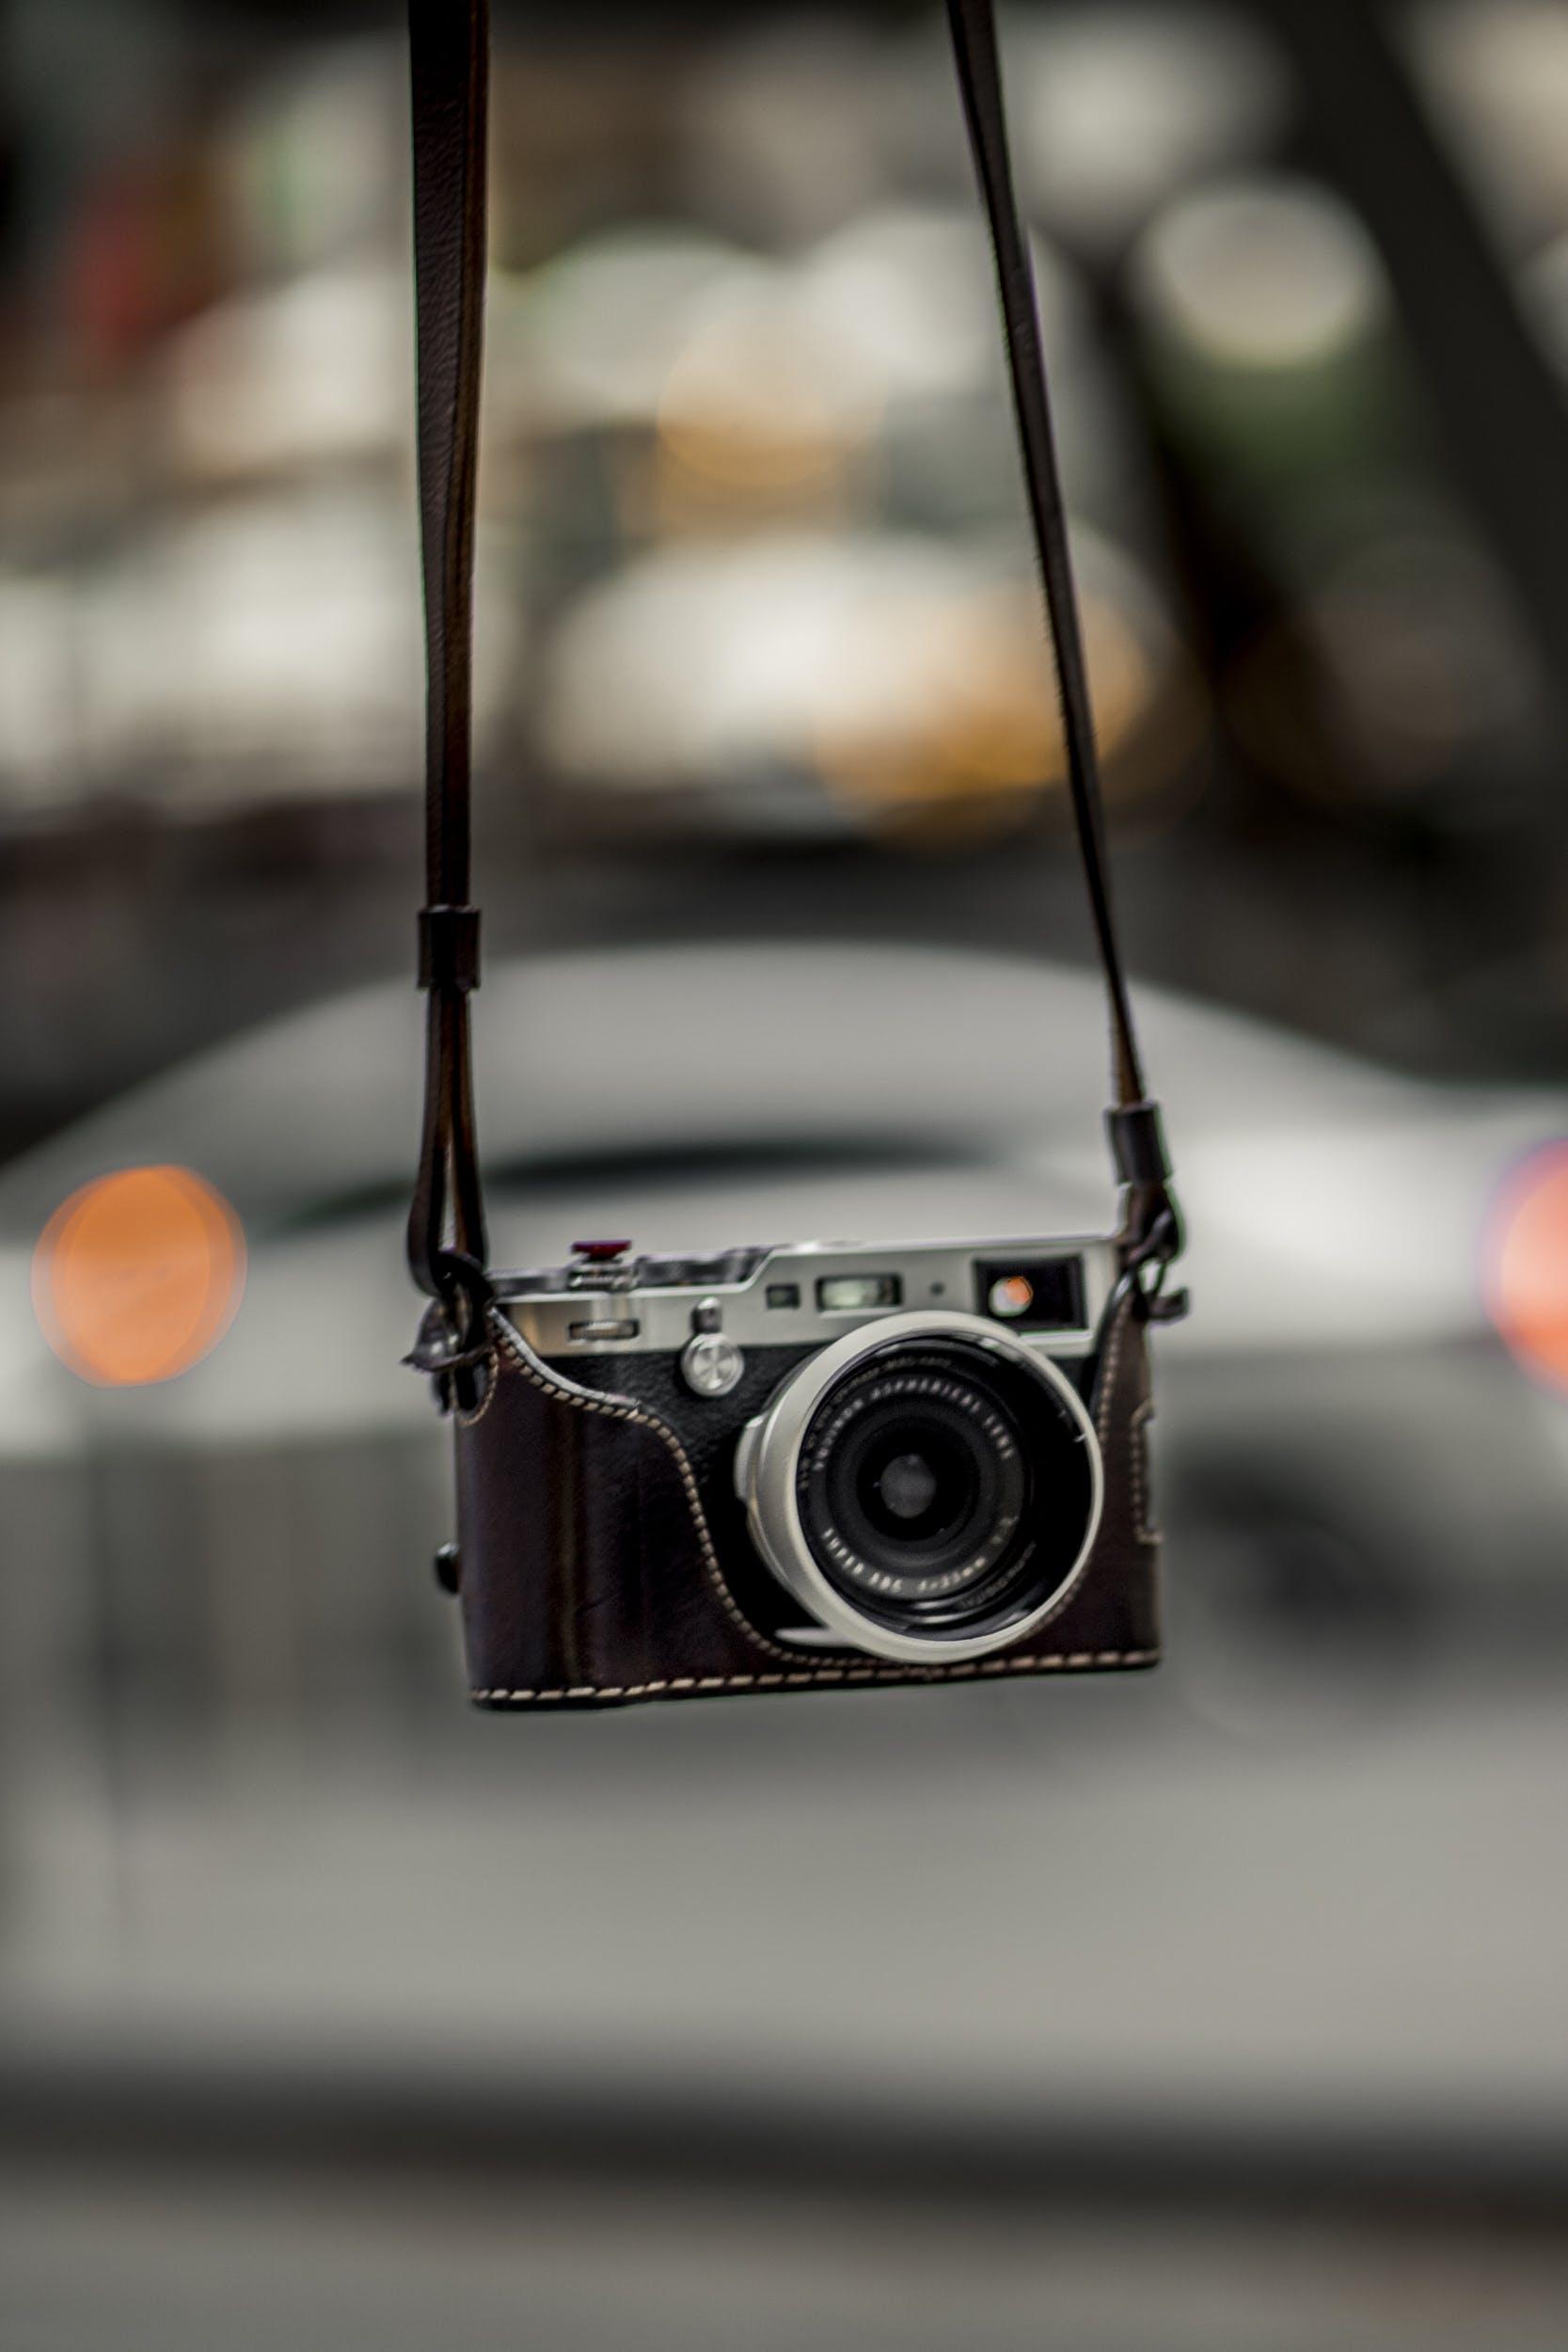 Close-Up Photo of Camera